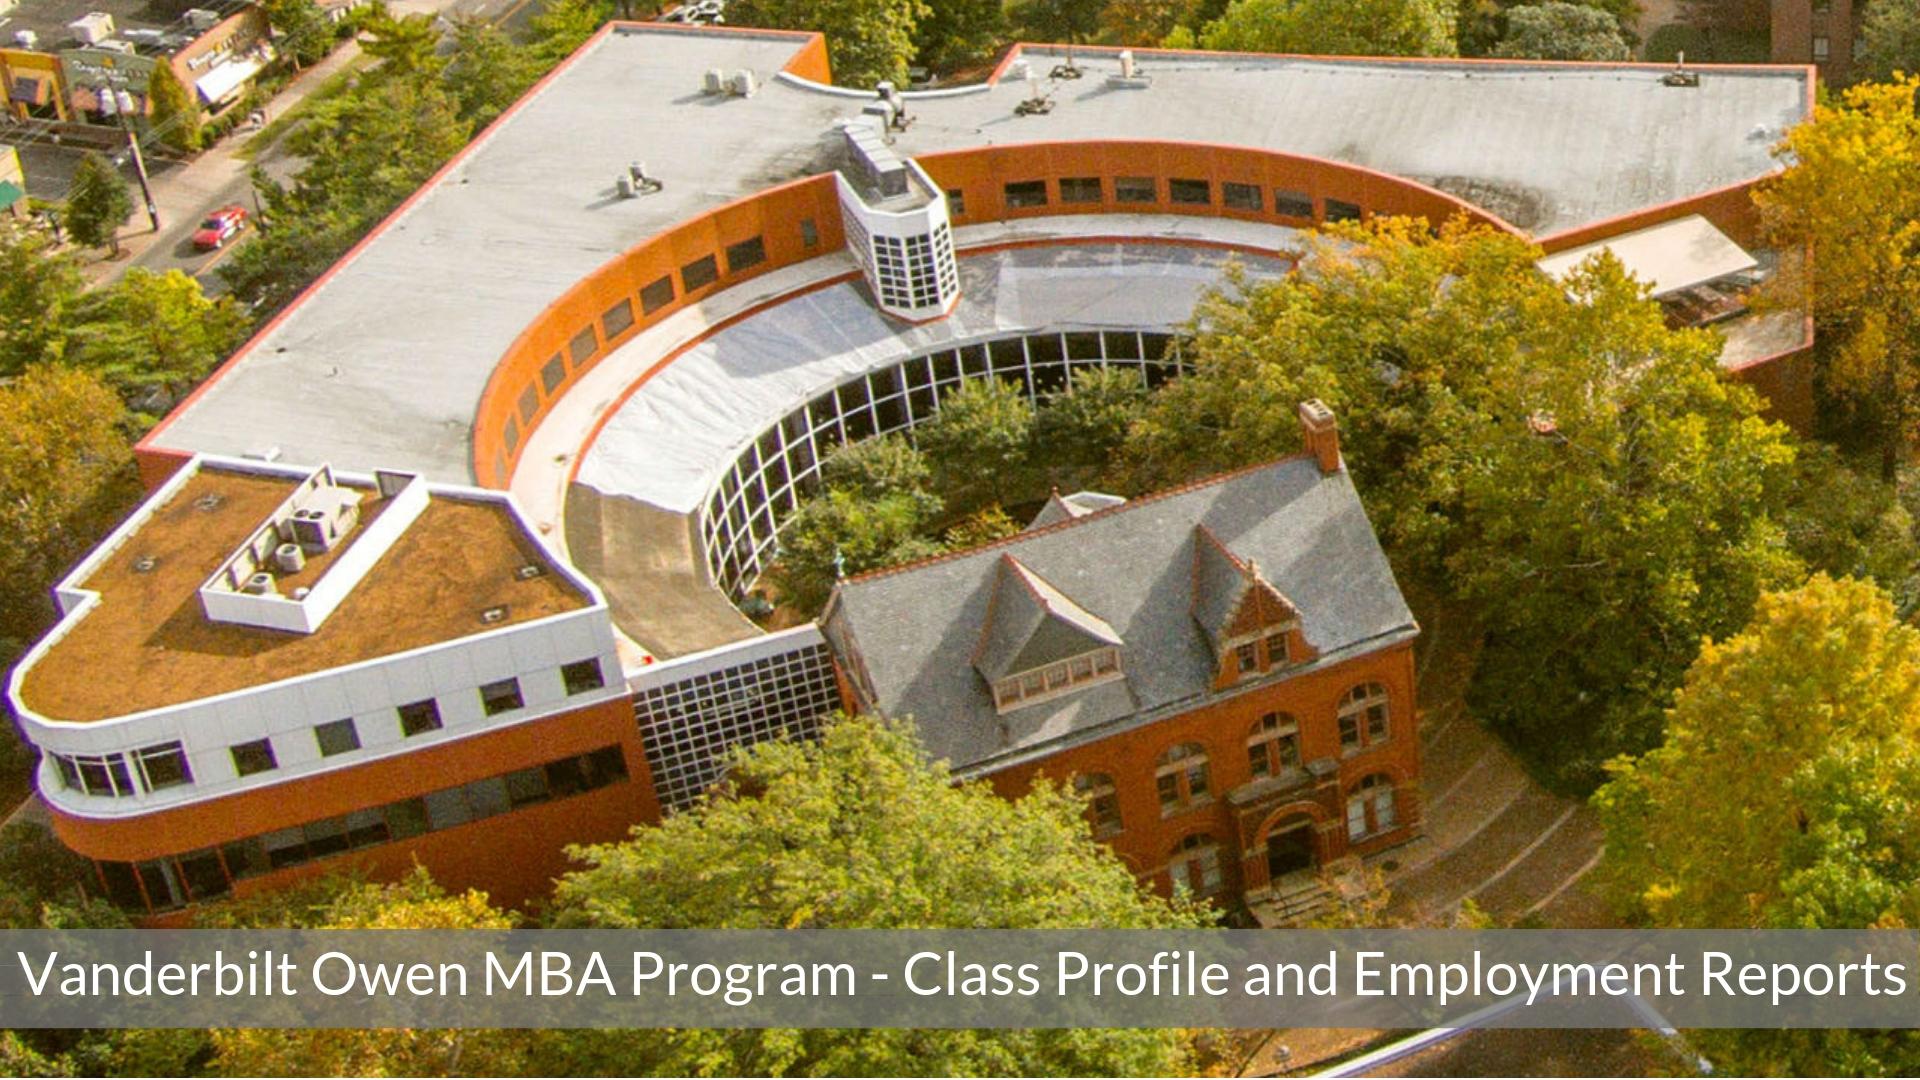 Vanderbilt Owen Graduate School of Management - Vanderbilt MBA Program - Class Profile, Employment Reports and Notable Alumni - Broad School of Business